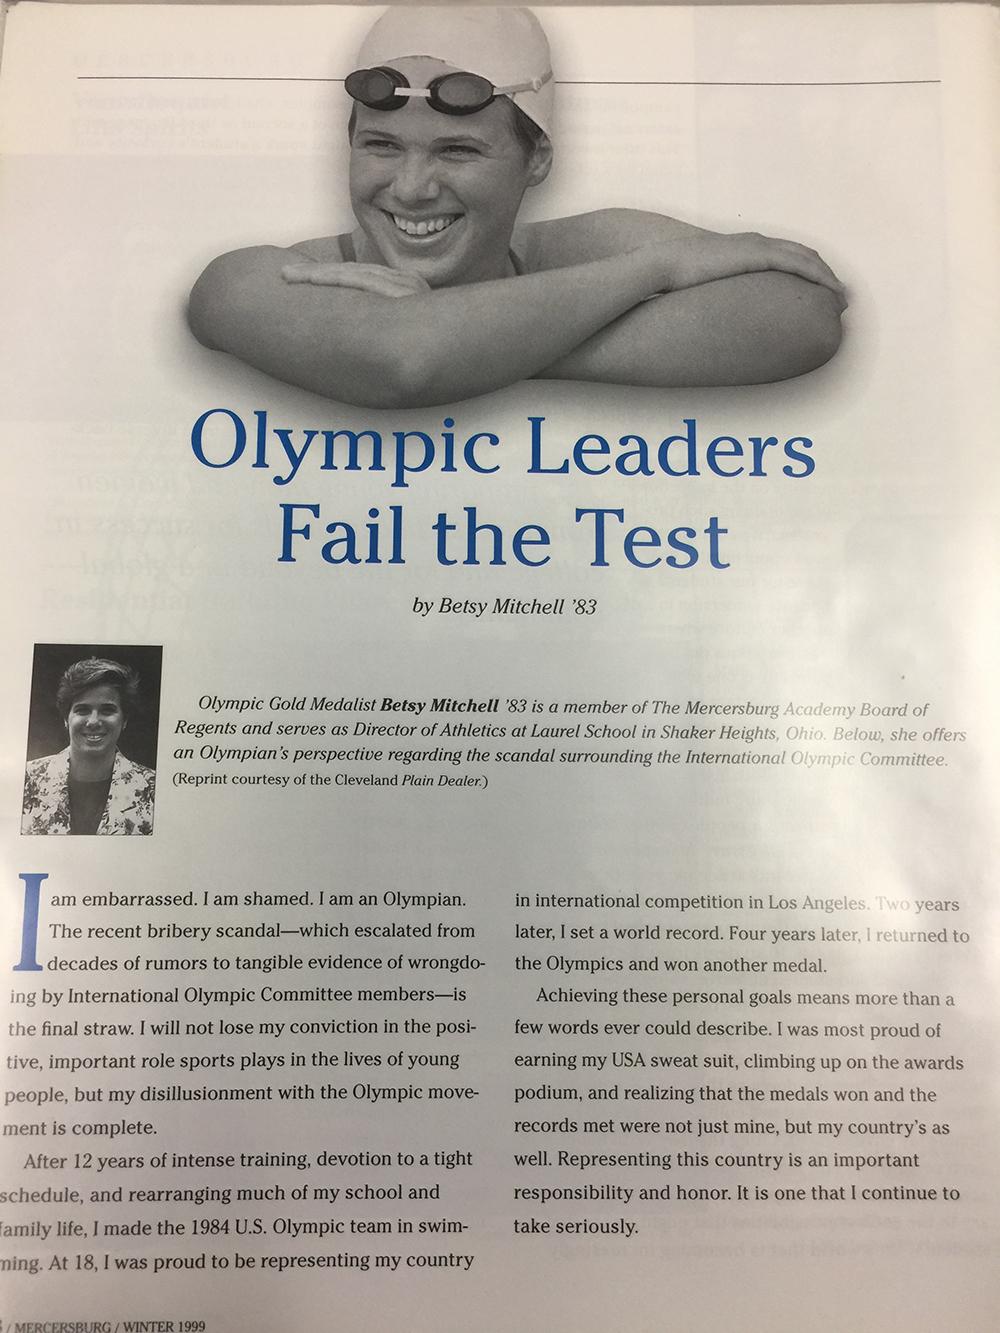 Mercersburg Academy publication (1989).